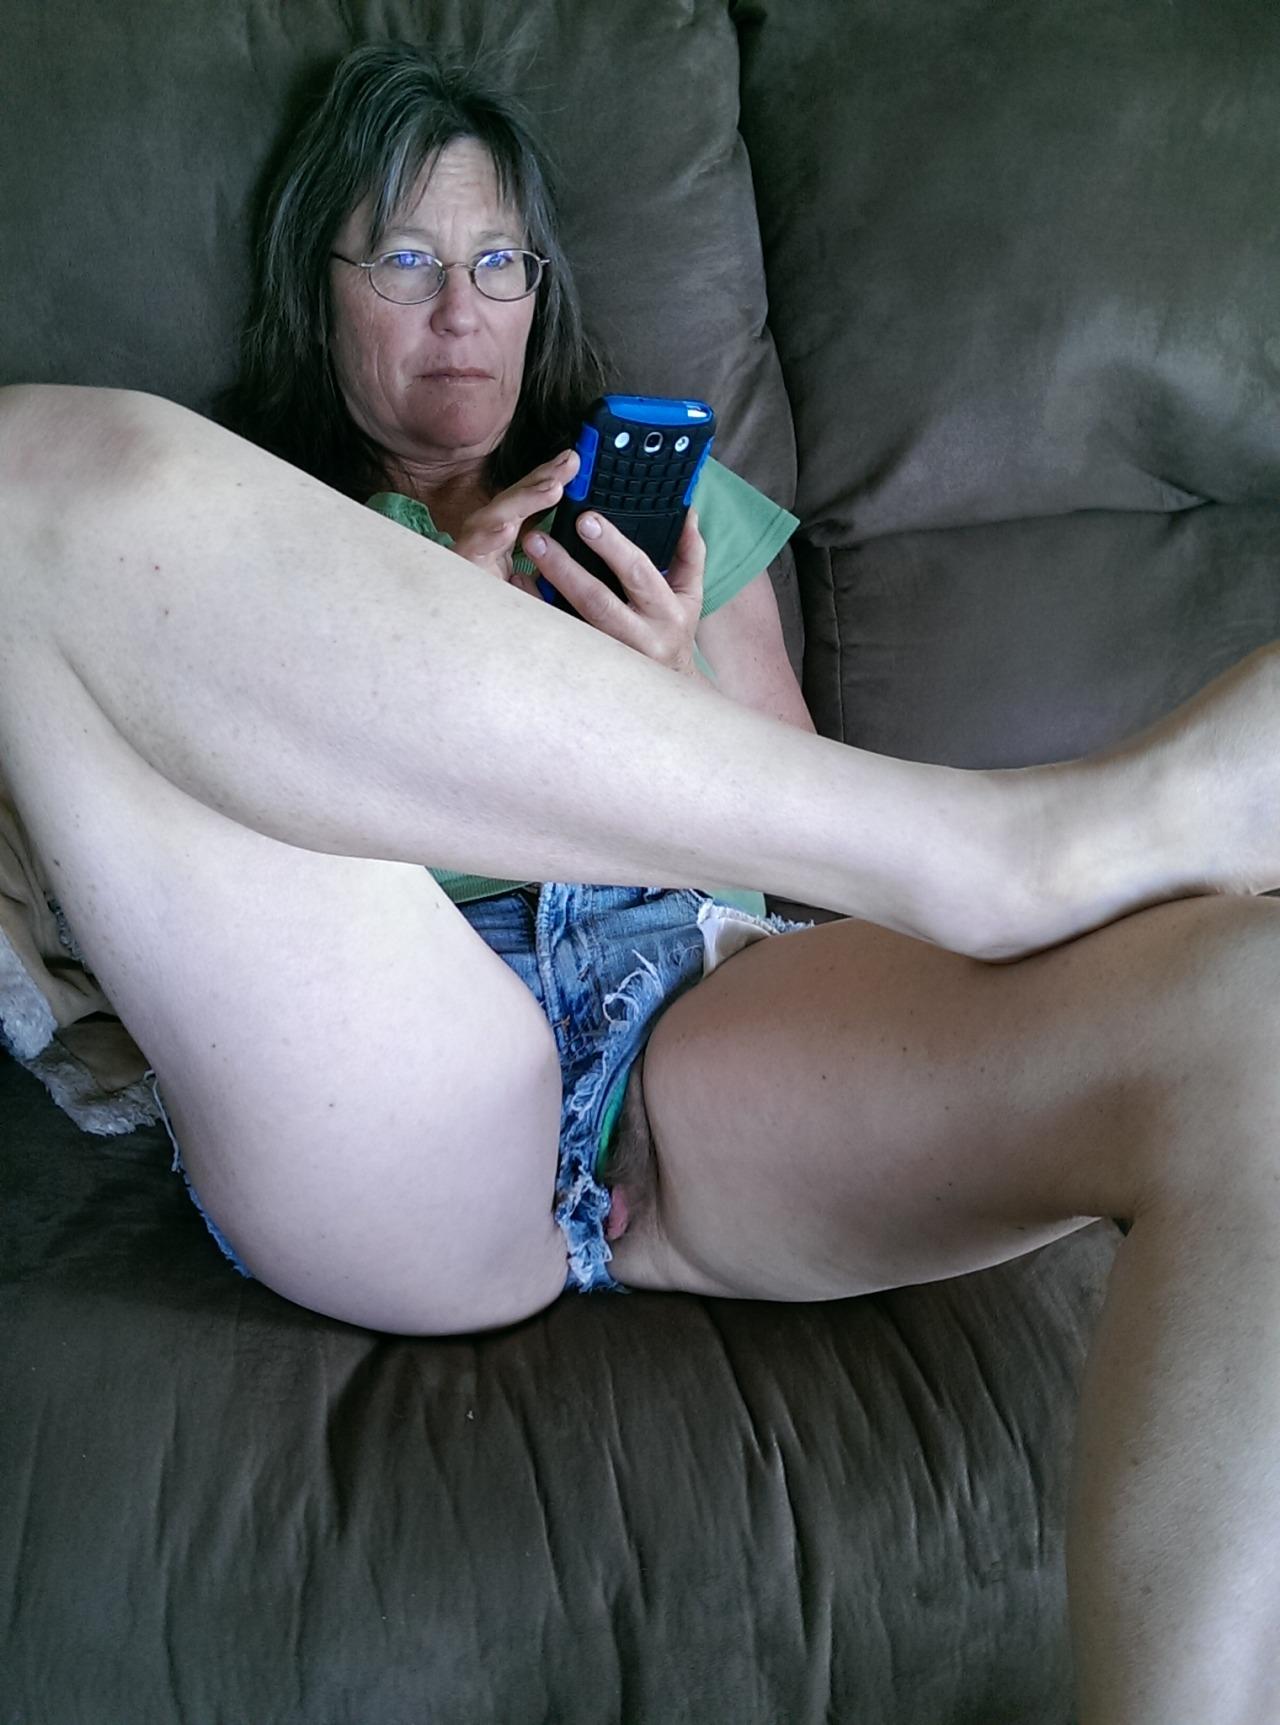 Real life voyeur videos  best voyeur amateur spycam and